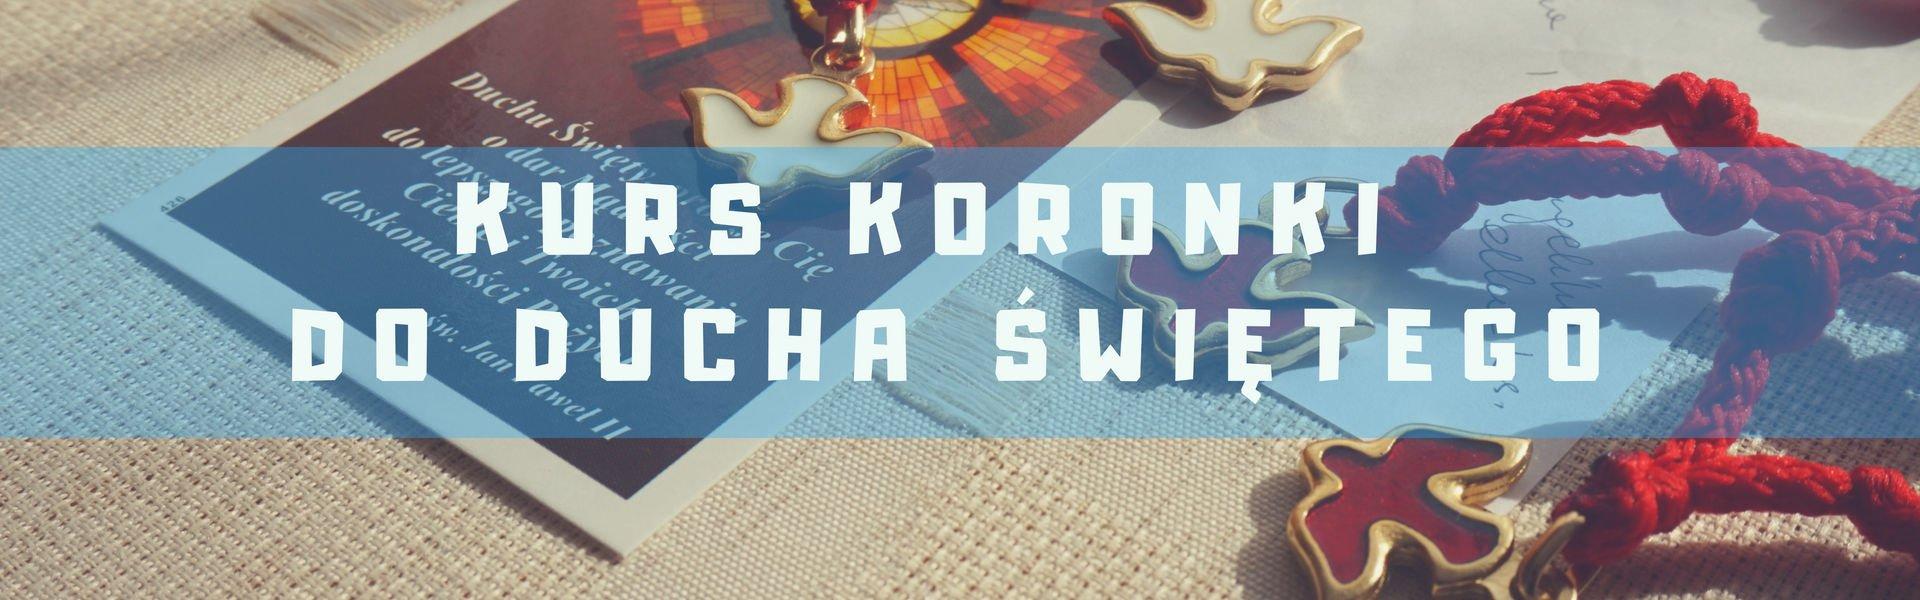 home_kurs_k